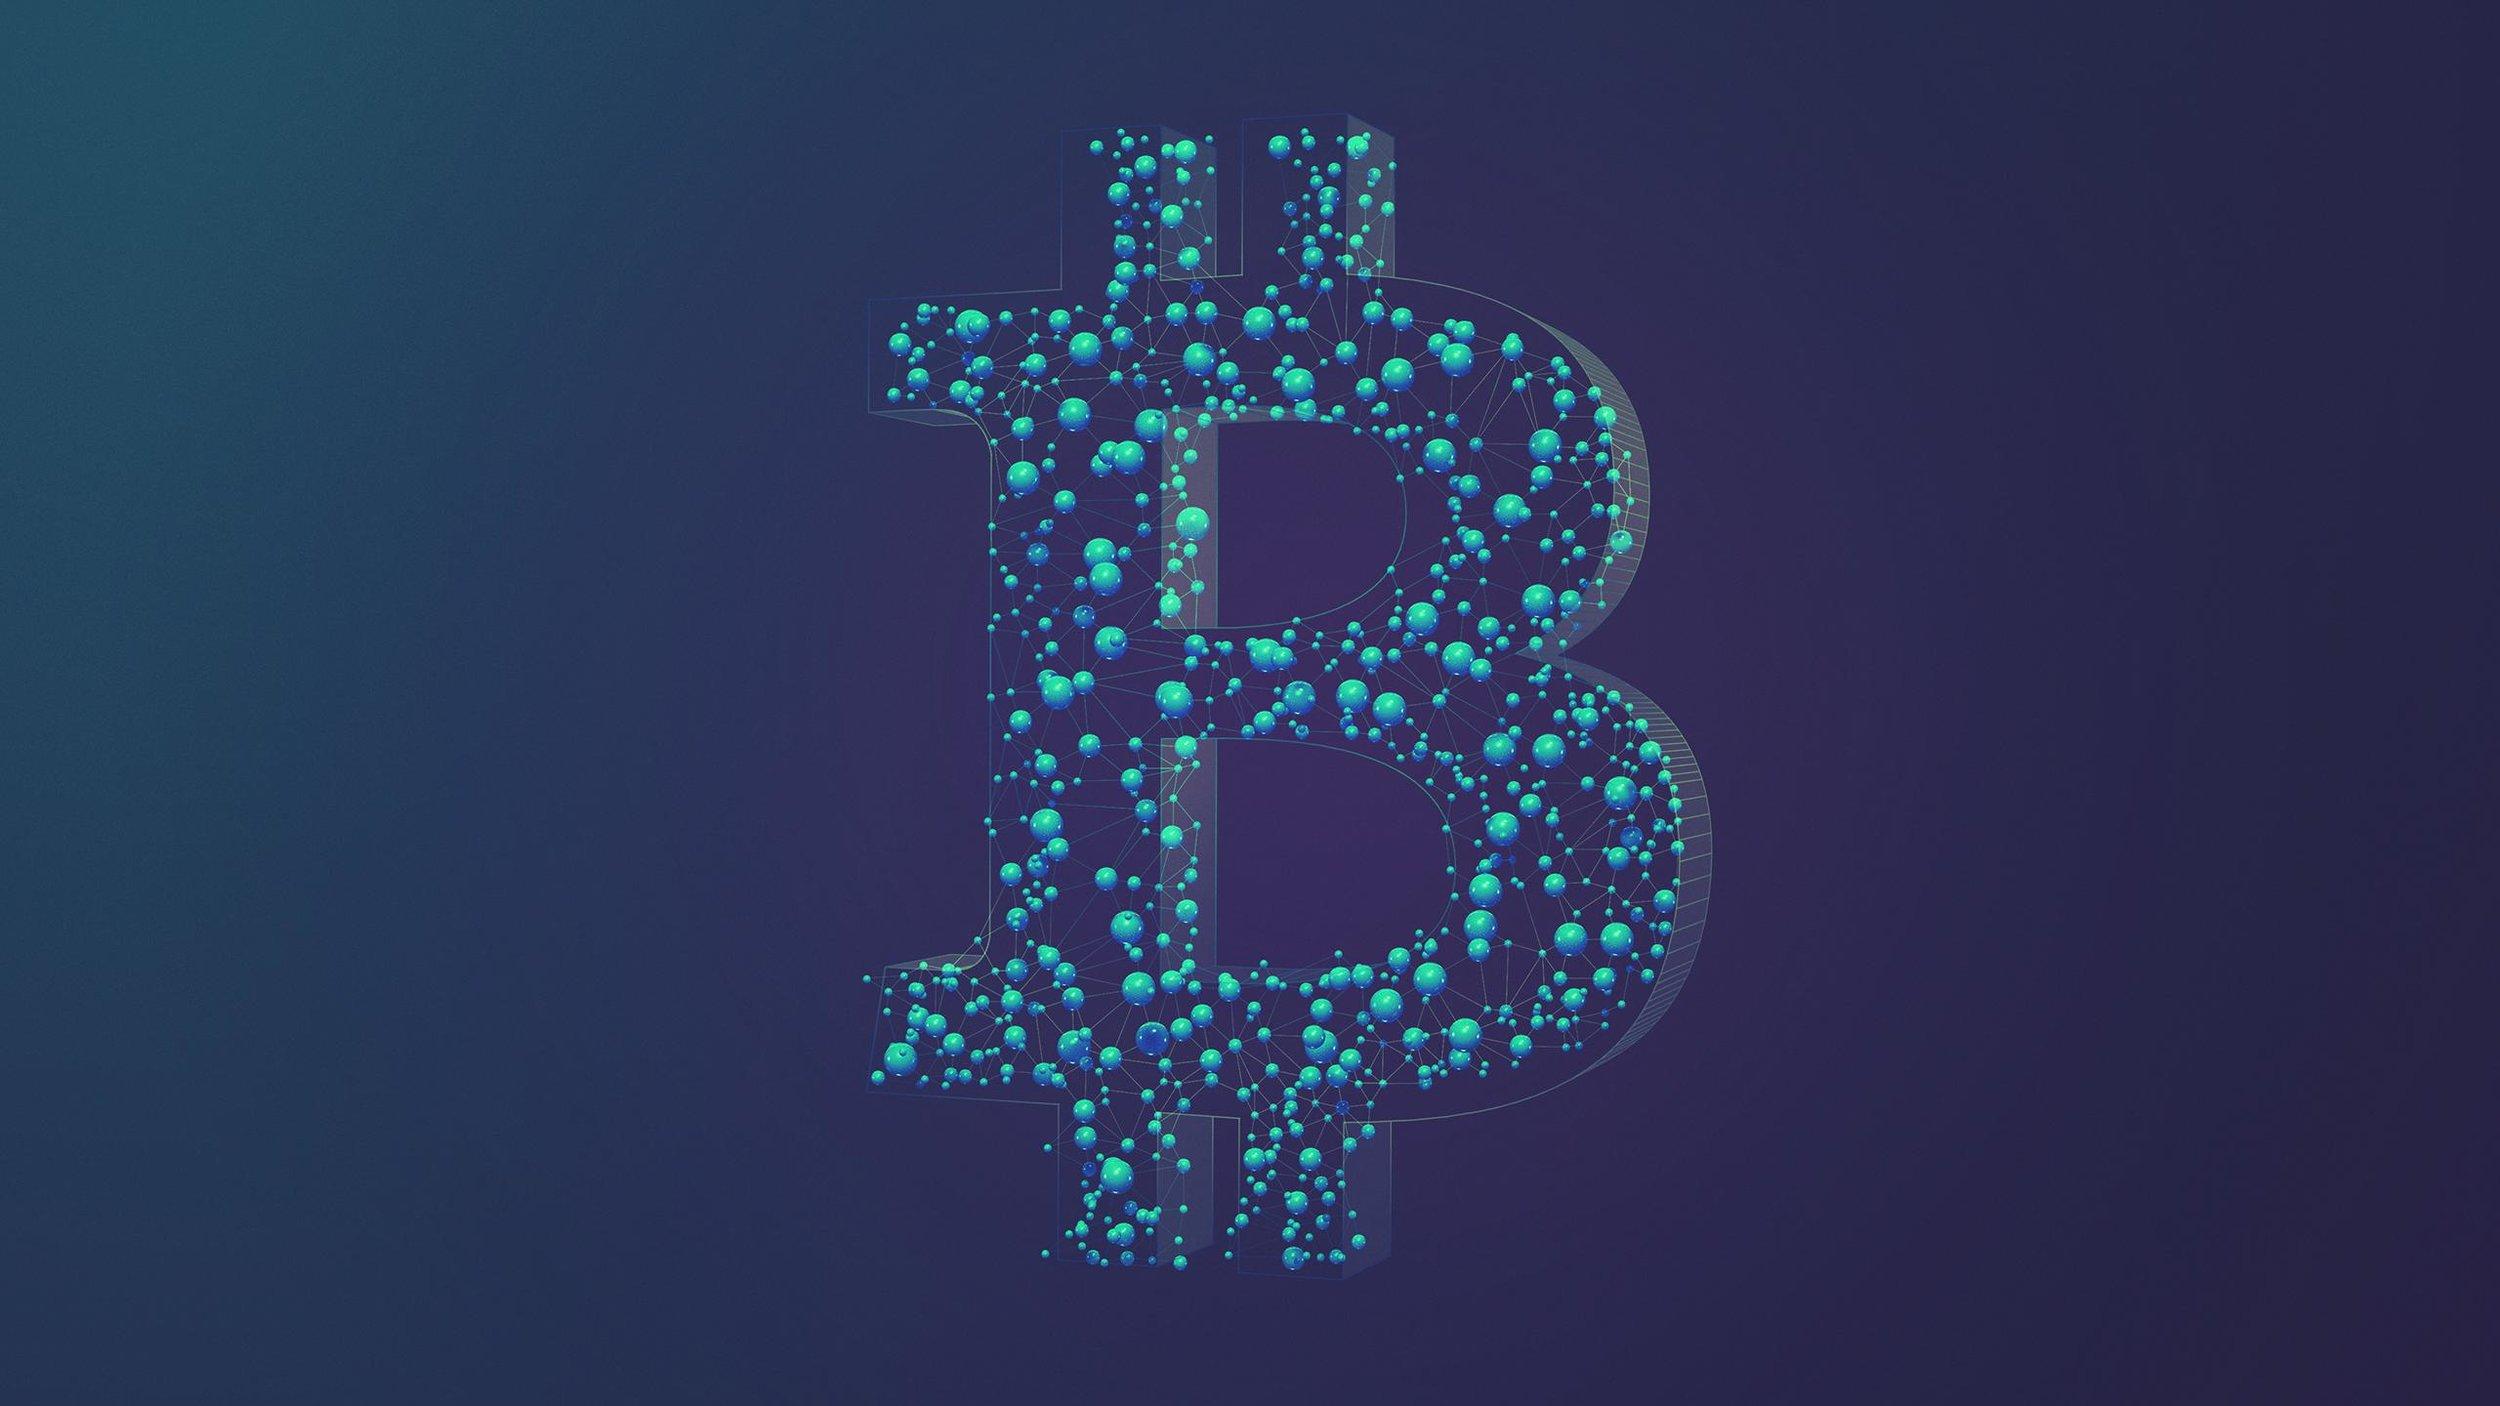 Bitcoin_Network_Blue_2560x1440.jpg